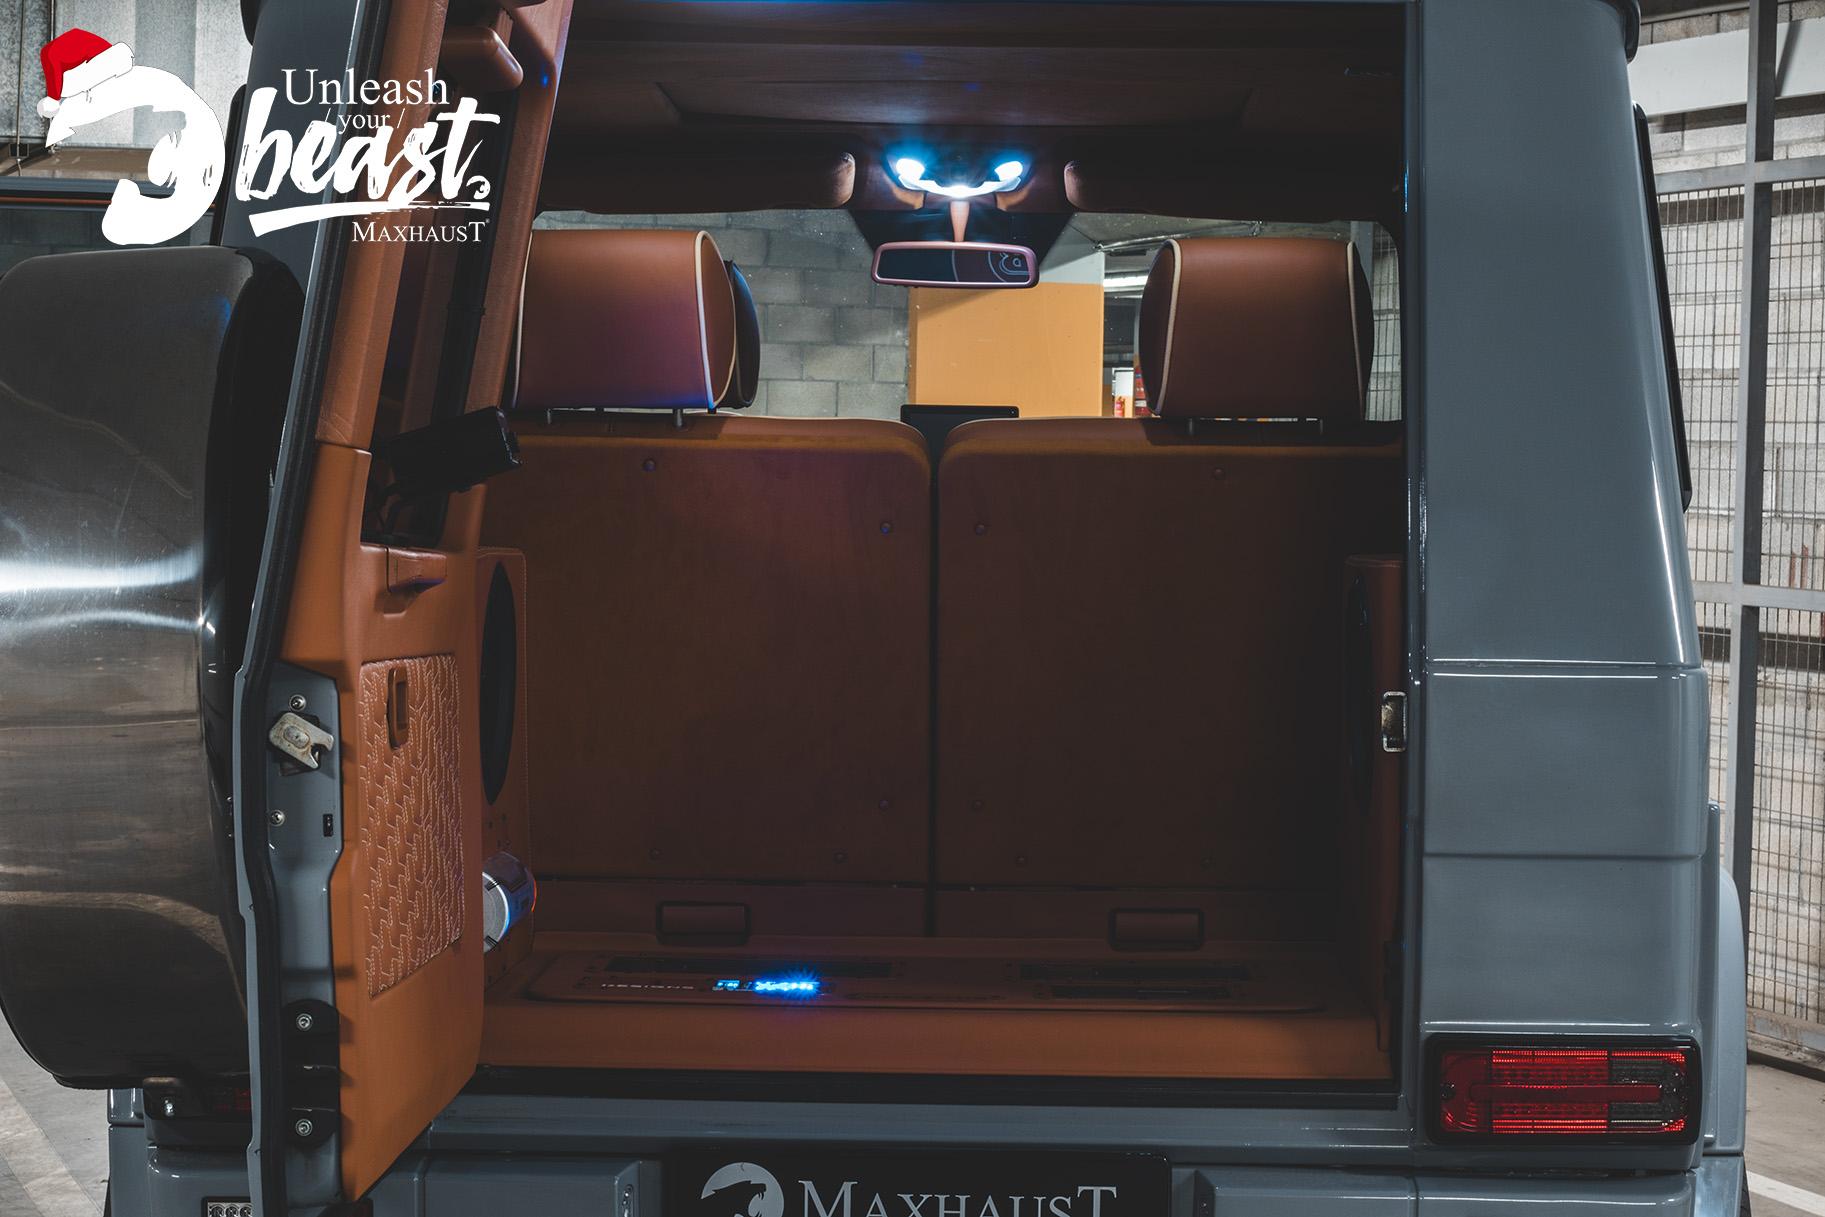 MERCEDES-BENZ G-CLASS AMG BRABUS MAXHAUST ACTIVE SOUD SYSTEM (7)